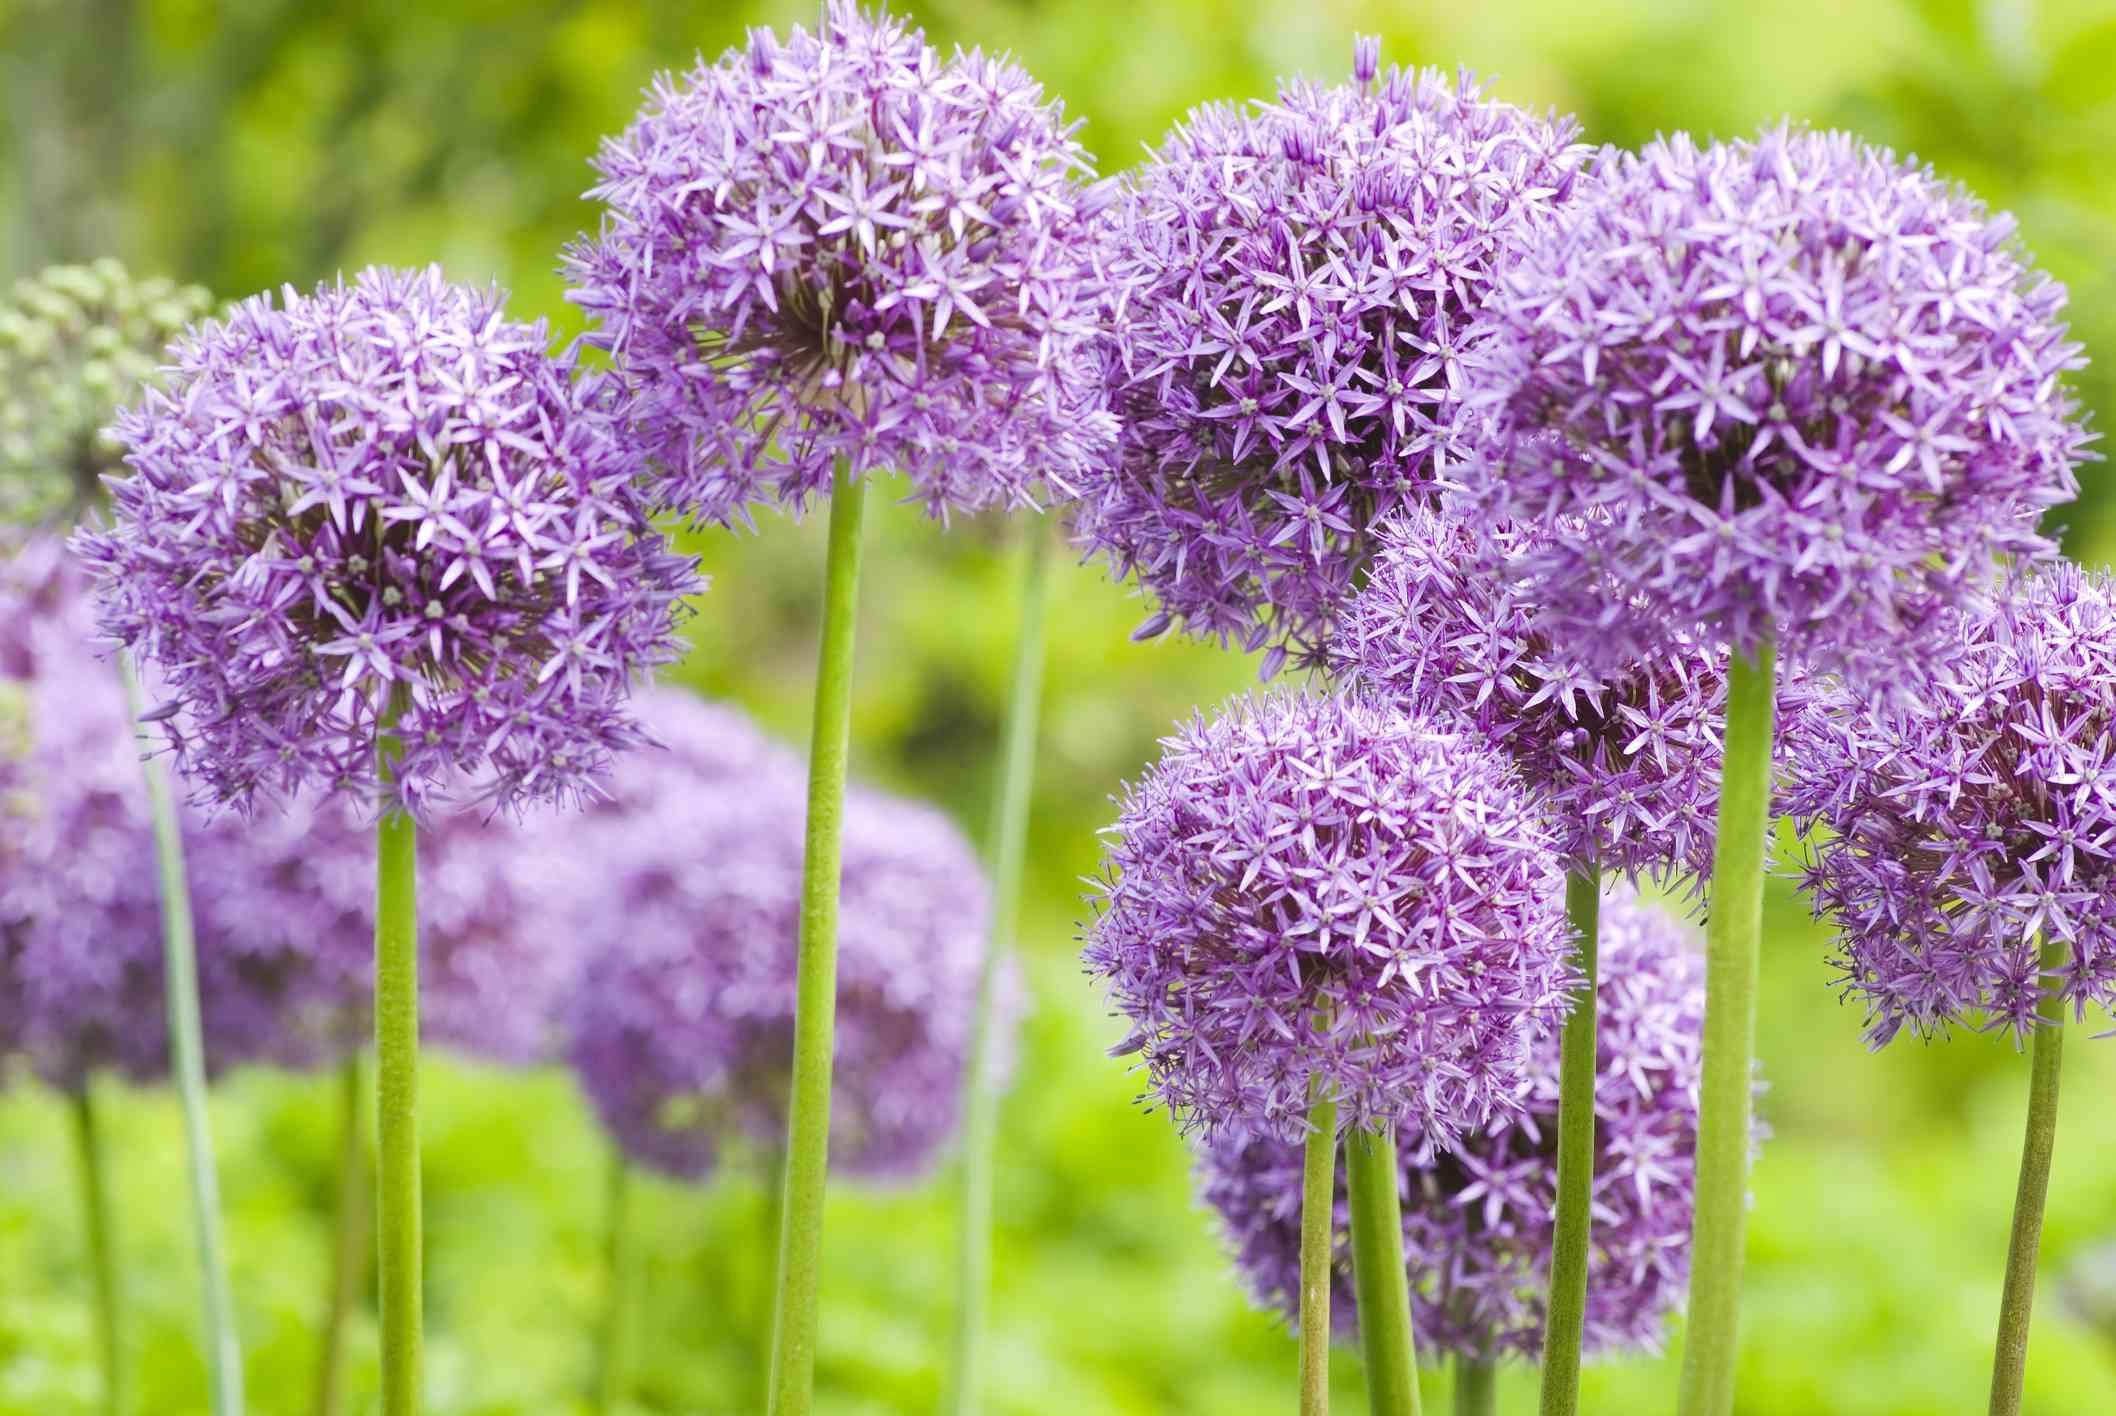 Purple, bulbous allium blooms growing in a bunch